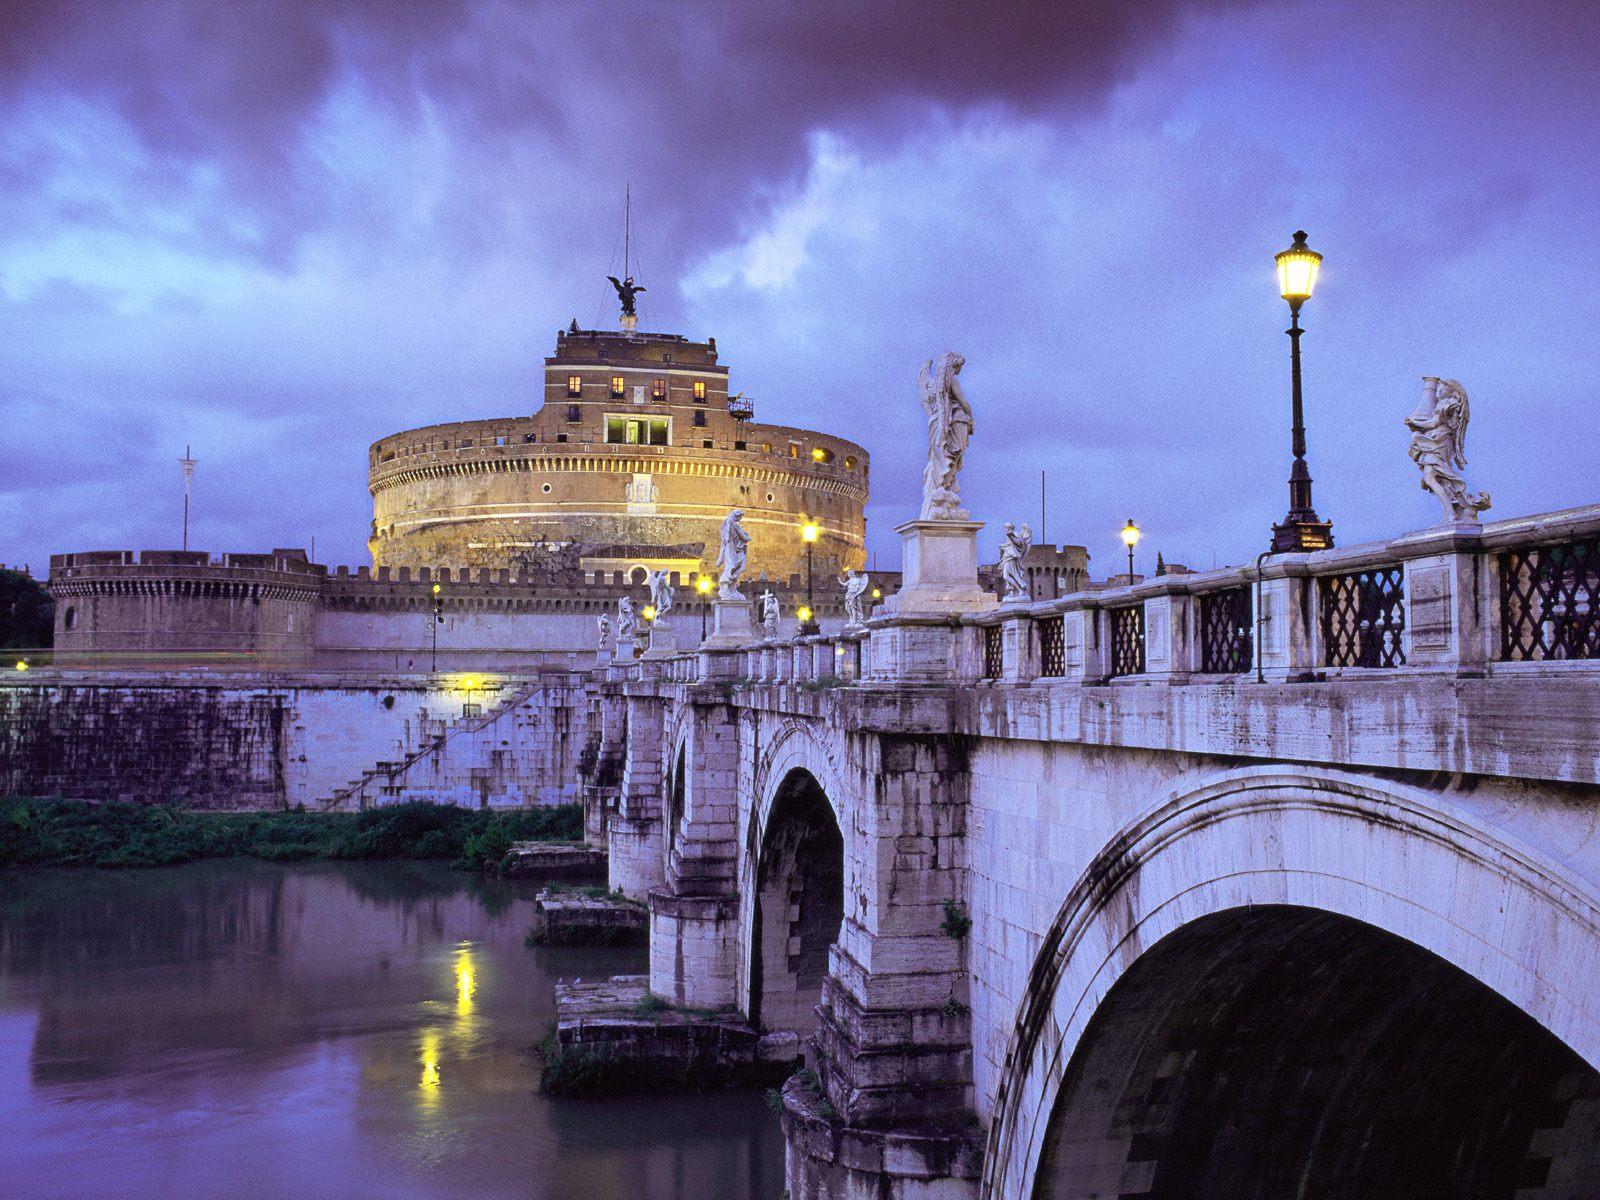 http://3.bp.blogspot.com/-8oIHmmHTEZg/Tcp2-LoQshI/AAAAAAAACWk/OrYclfHBvgI/s1600/Castel+Sant%2527Angelo+and+Bridge%252C+Rome%252C+Italy.jpg